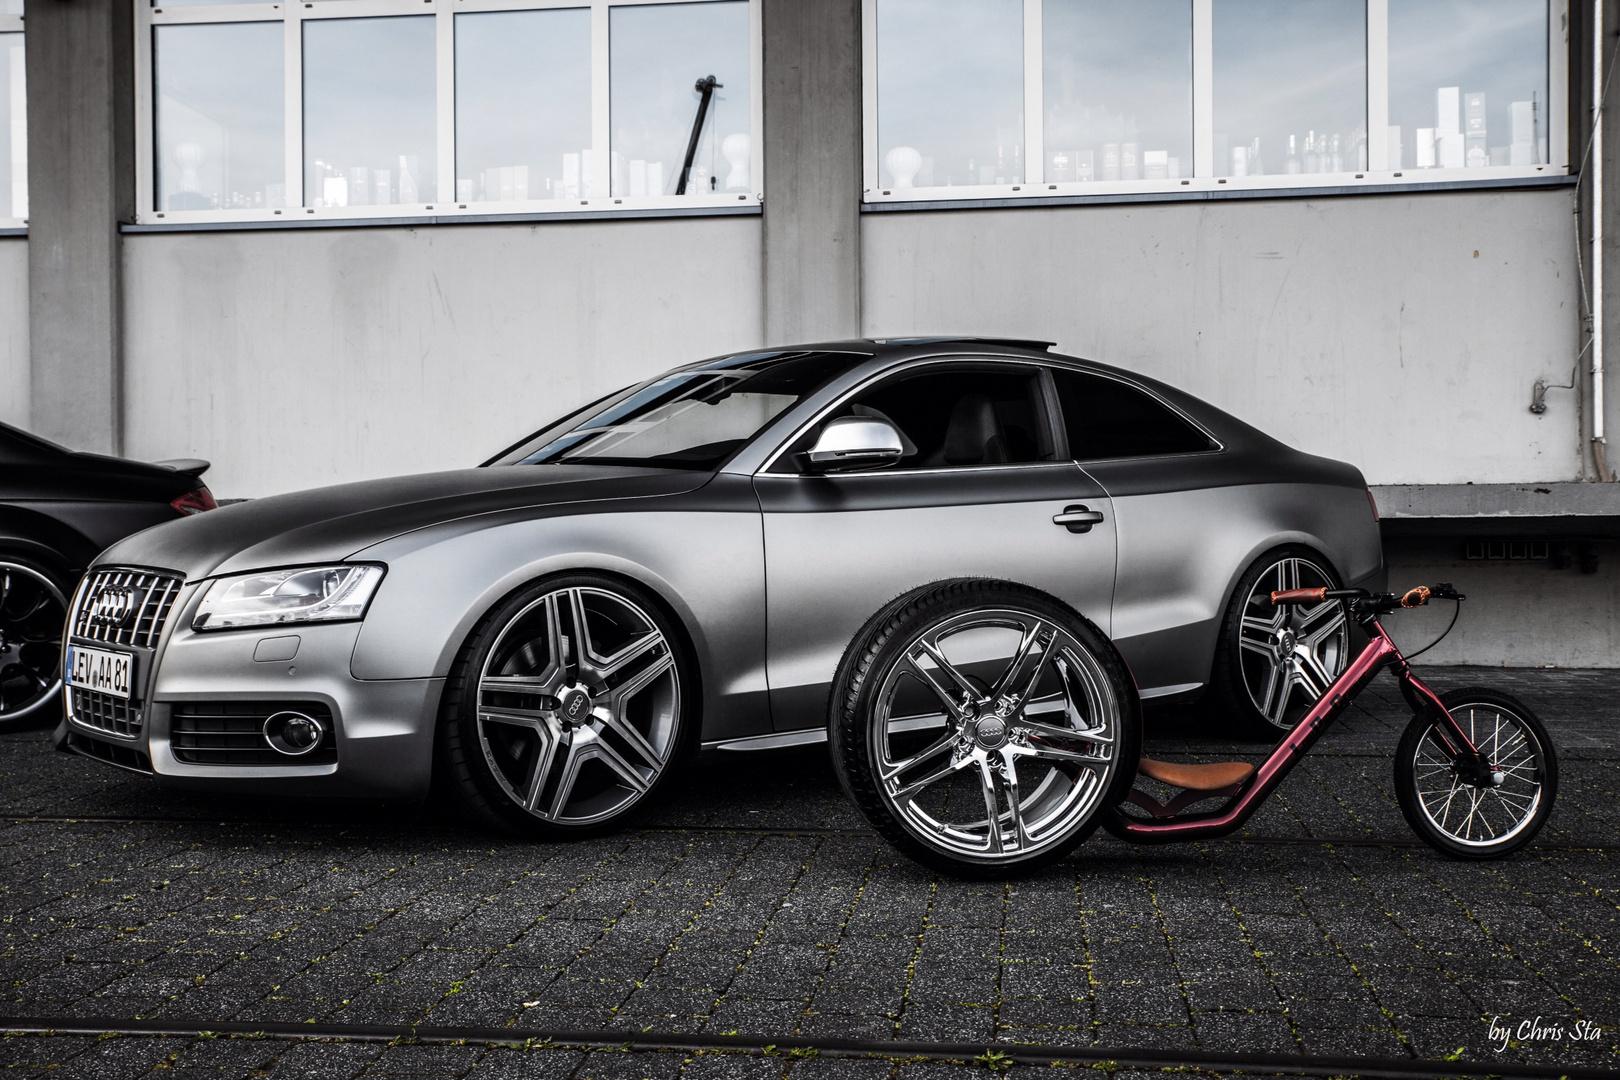 Audi S5 & Low Pipe Cruiser